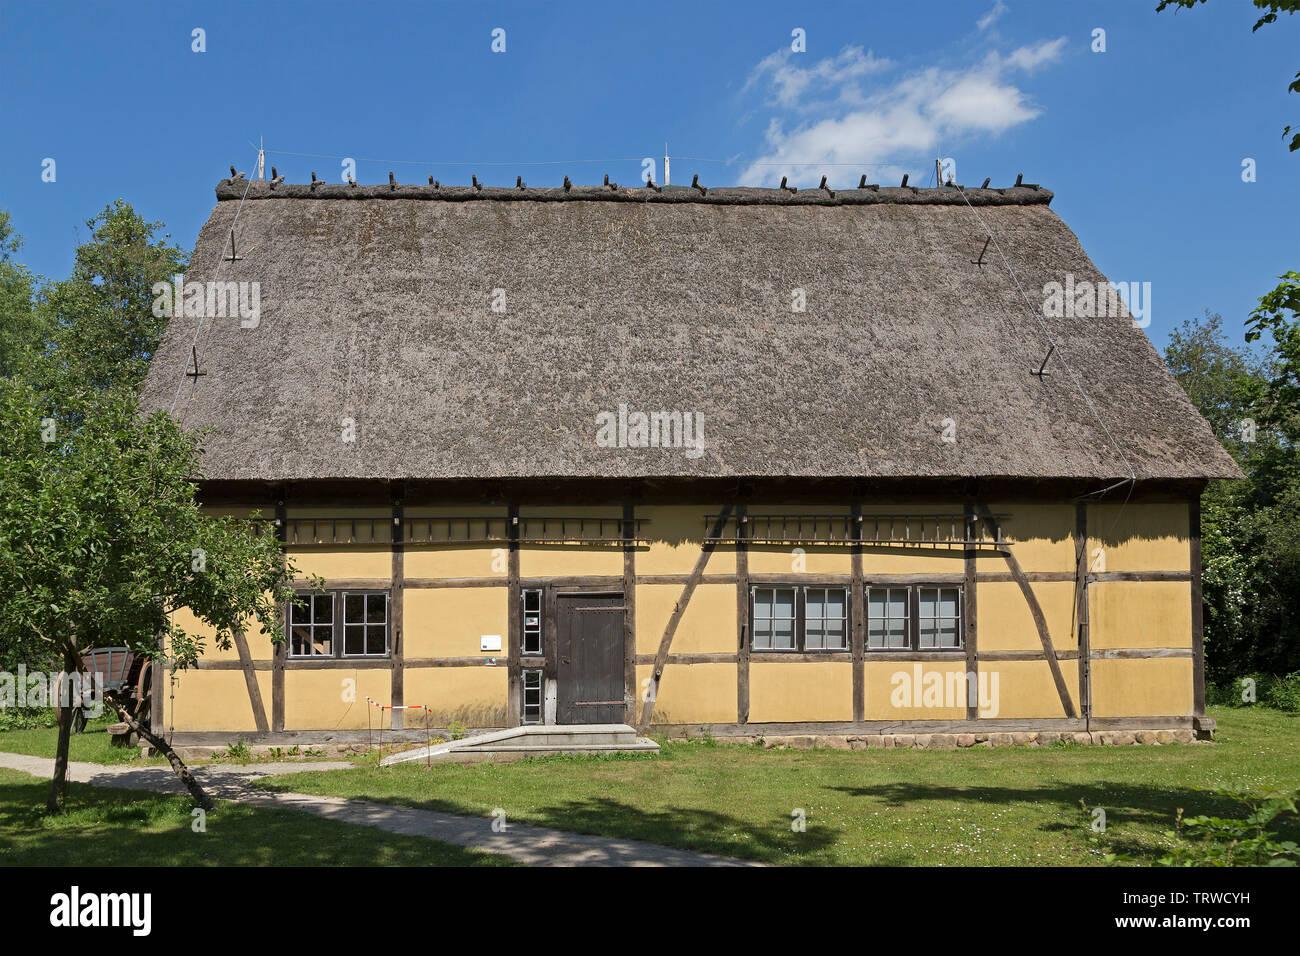 open-air museum during Kulturelle Landpartie, Luebeln, Wendland, Lower Saxony, Germany - Stock Image